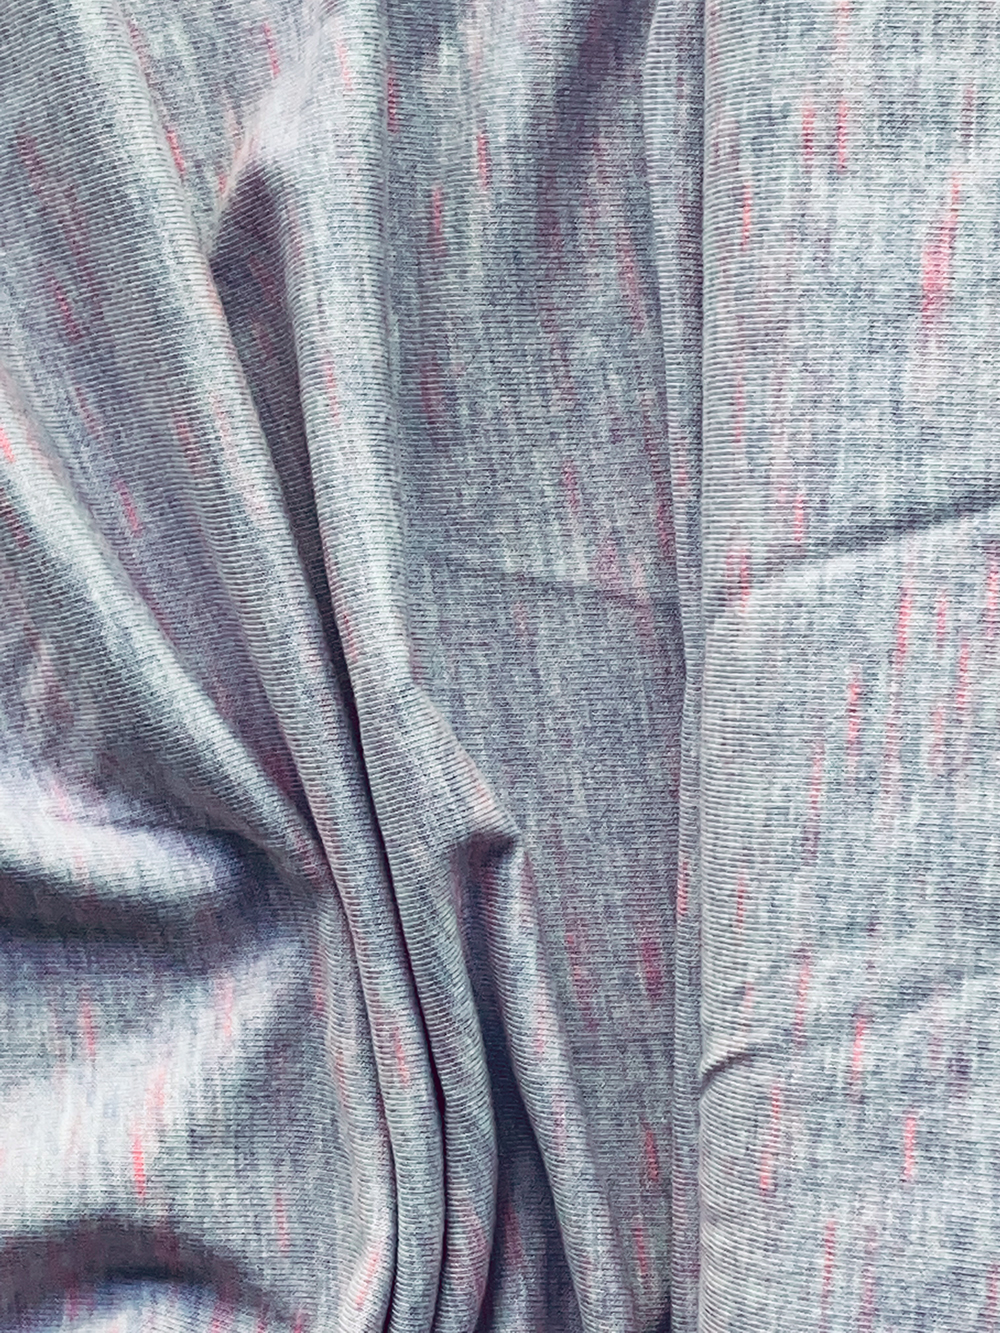 Viscose-Jersey meliert, flieder-neonpink